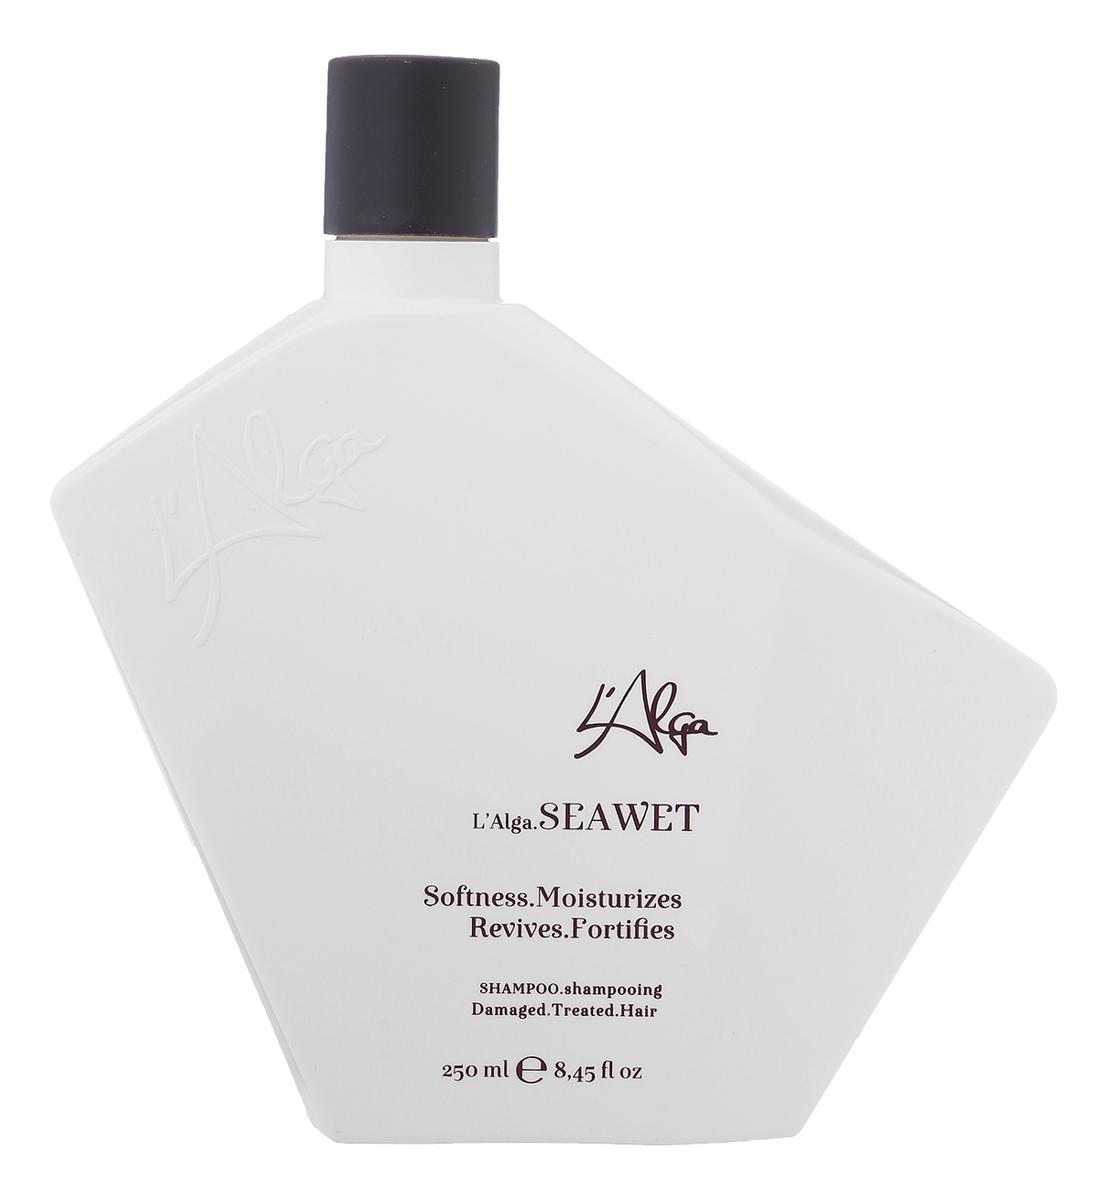 Купить Оздоравливающий шампунь для волос Seawet Shampoo: Шампунь 250мл, L'Alga